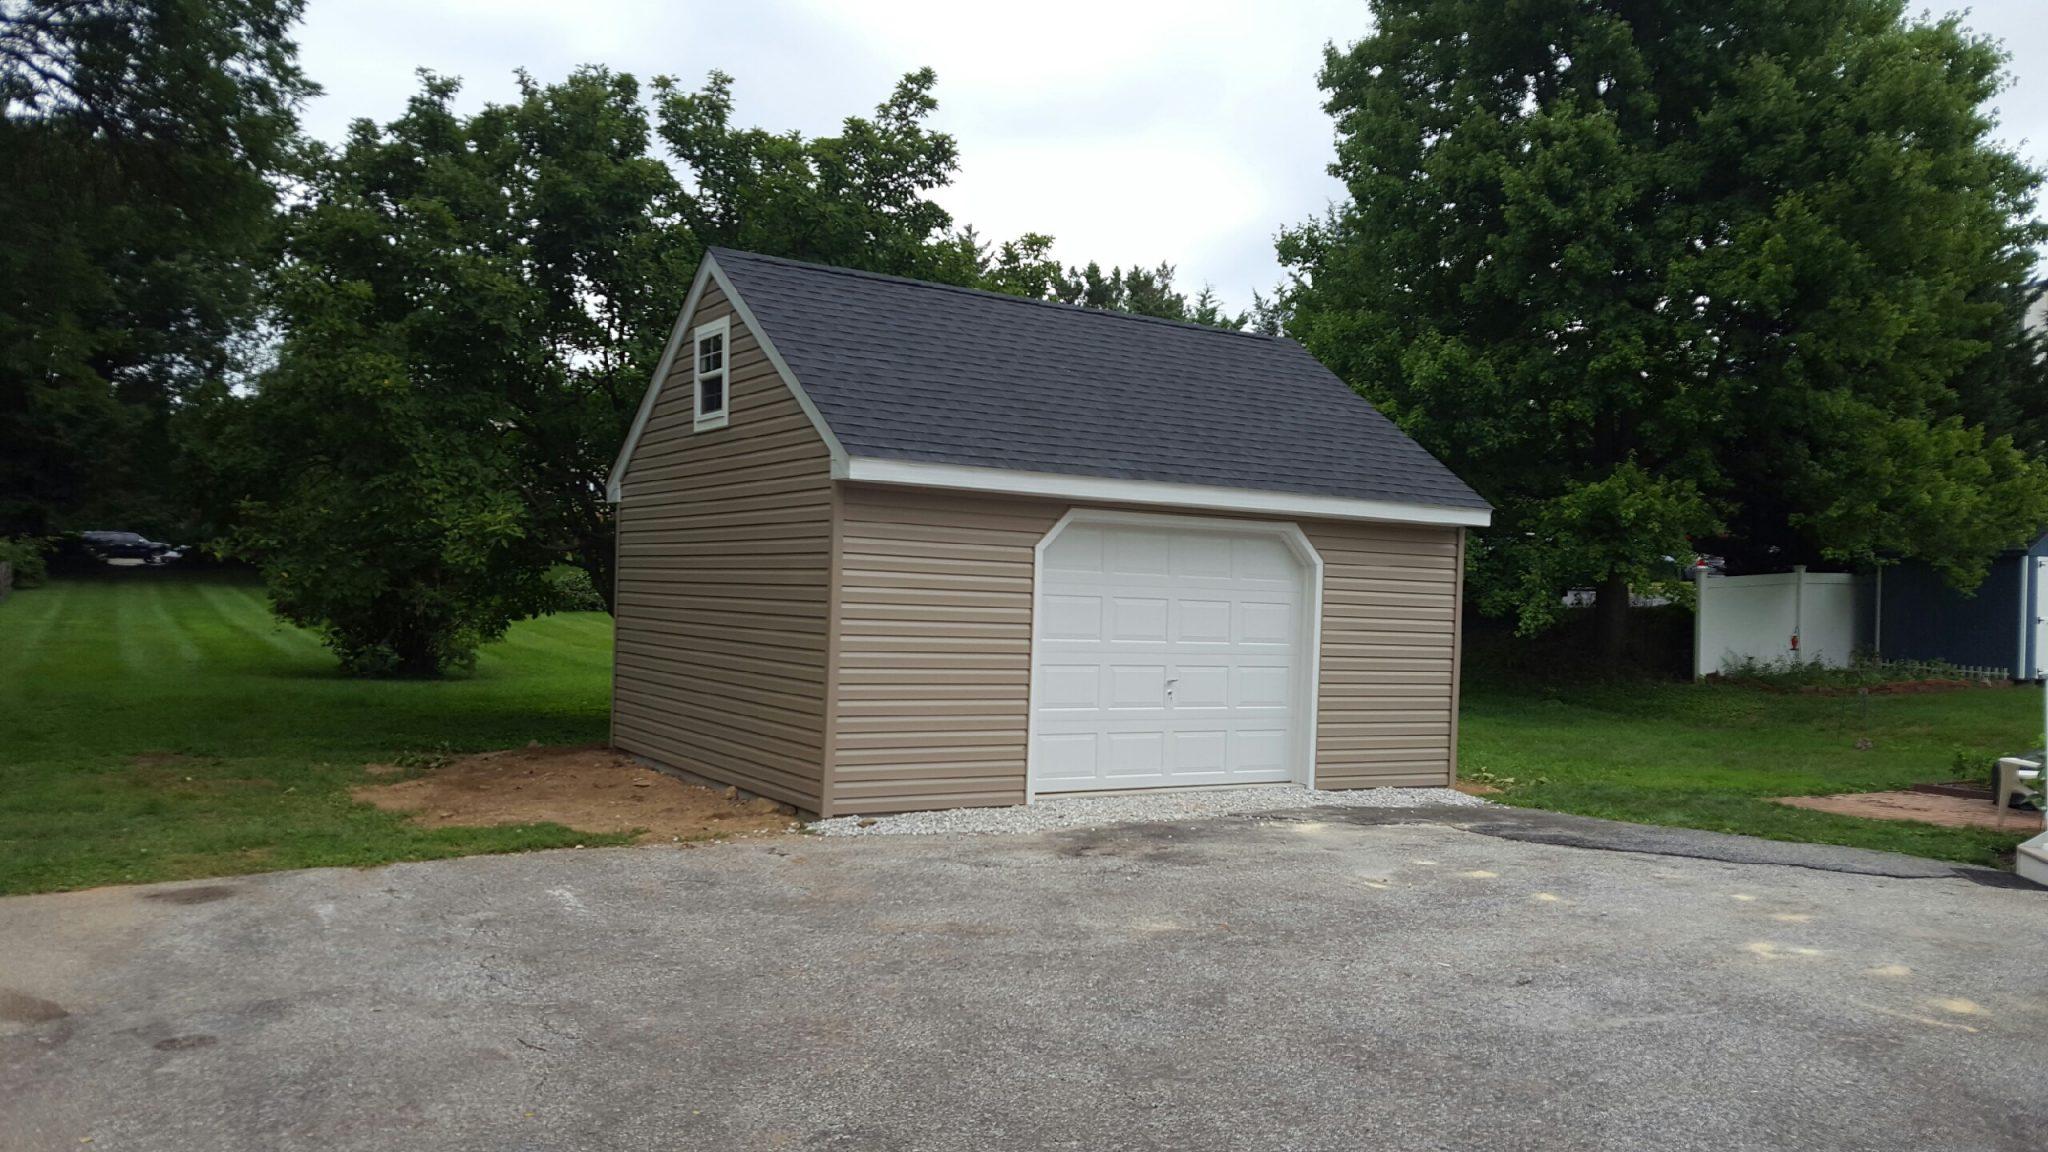 16x20-w-8-12-attic-package